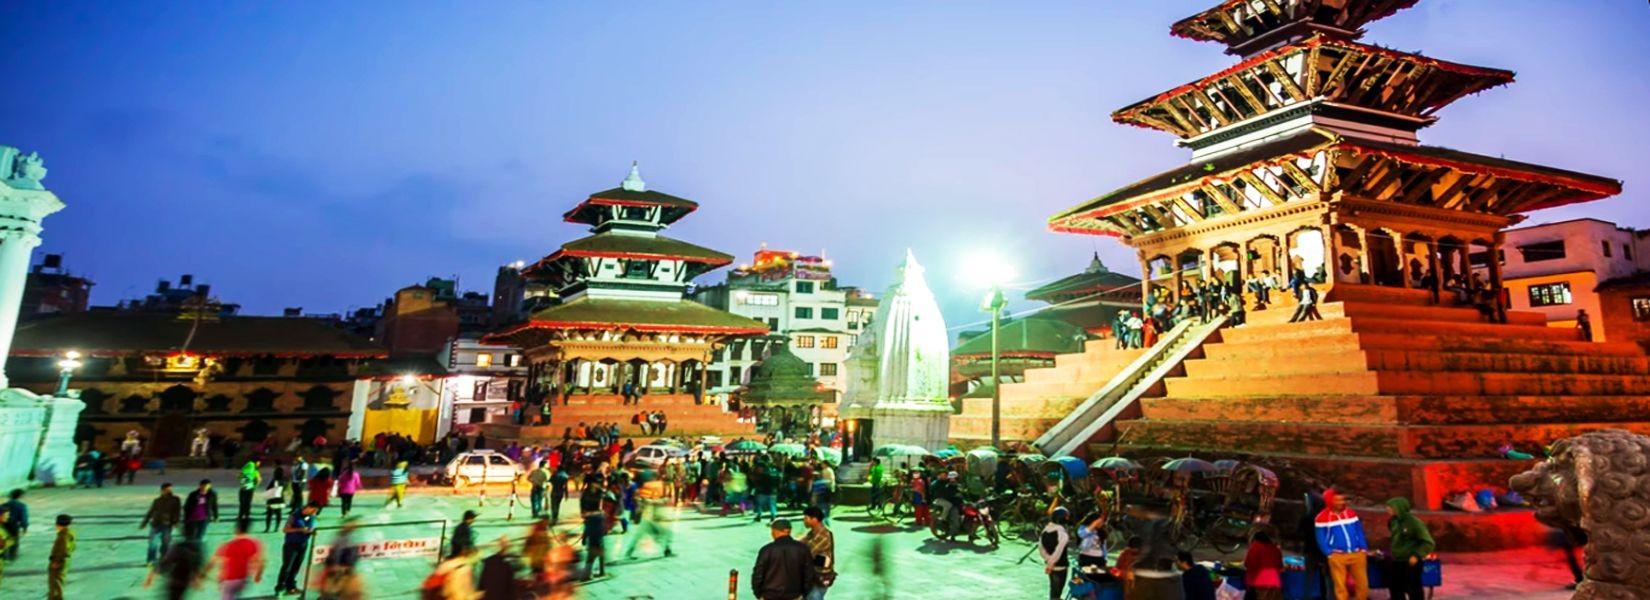 Kathmandu Pokhara Nagarkot Tour